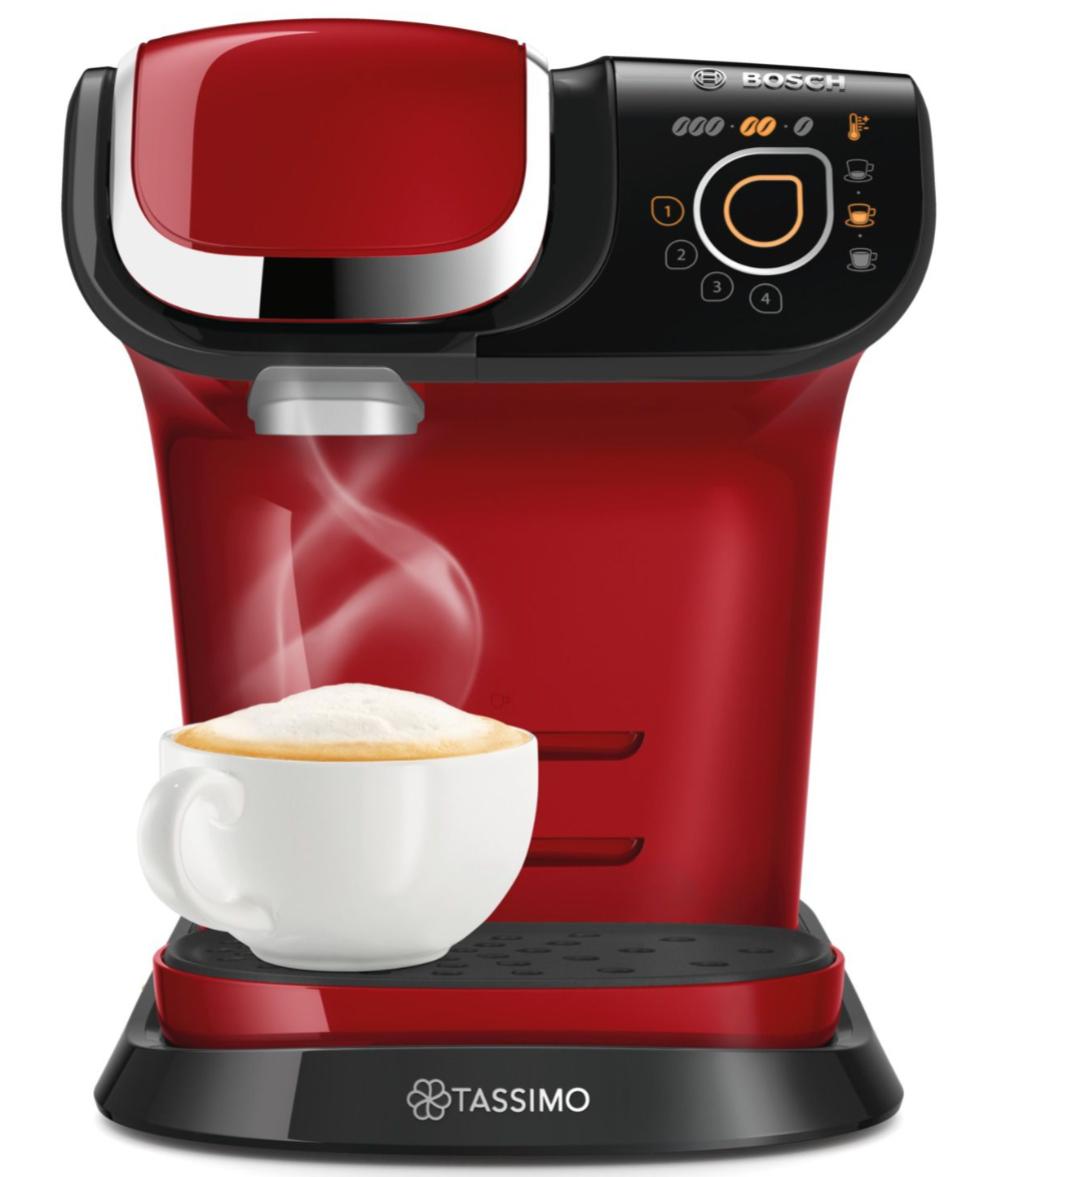 Machine Multi-Boissons Bosch TAS6003 - 1300 W, 1,3 L, Rouge ou Blanc